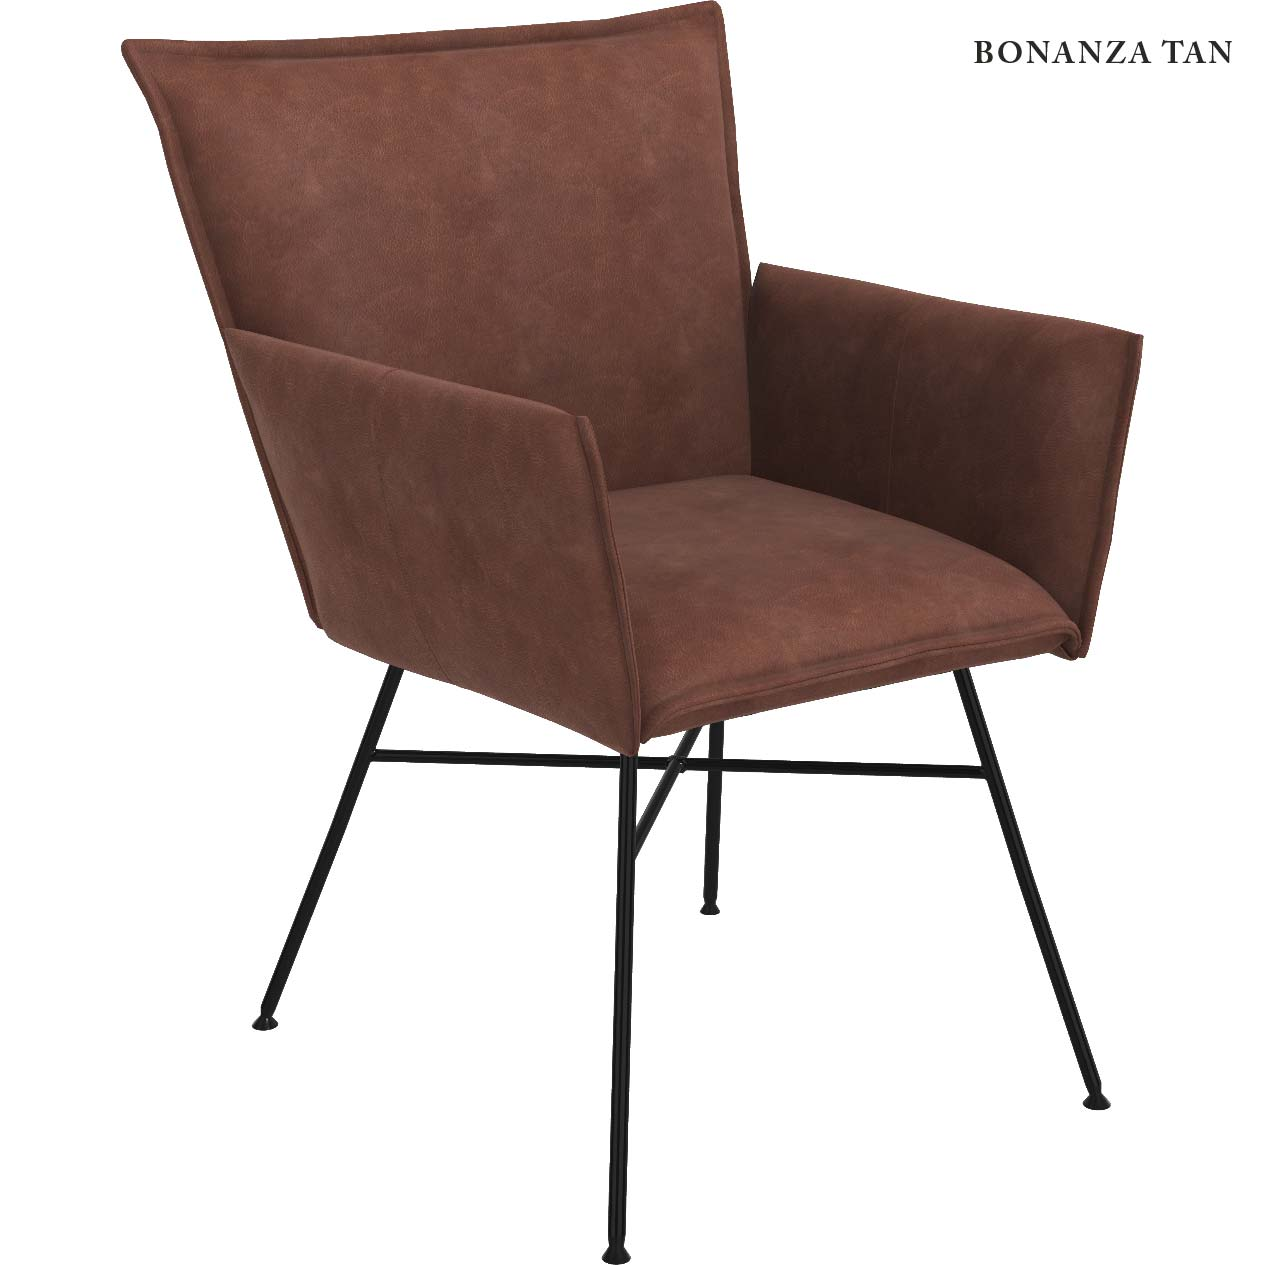 jess-design-sessel-stuhl-sanne-armlehne-bonanza-tan-lichtraum24